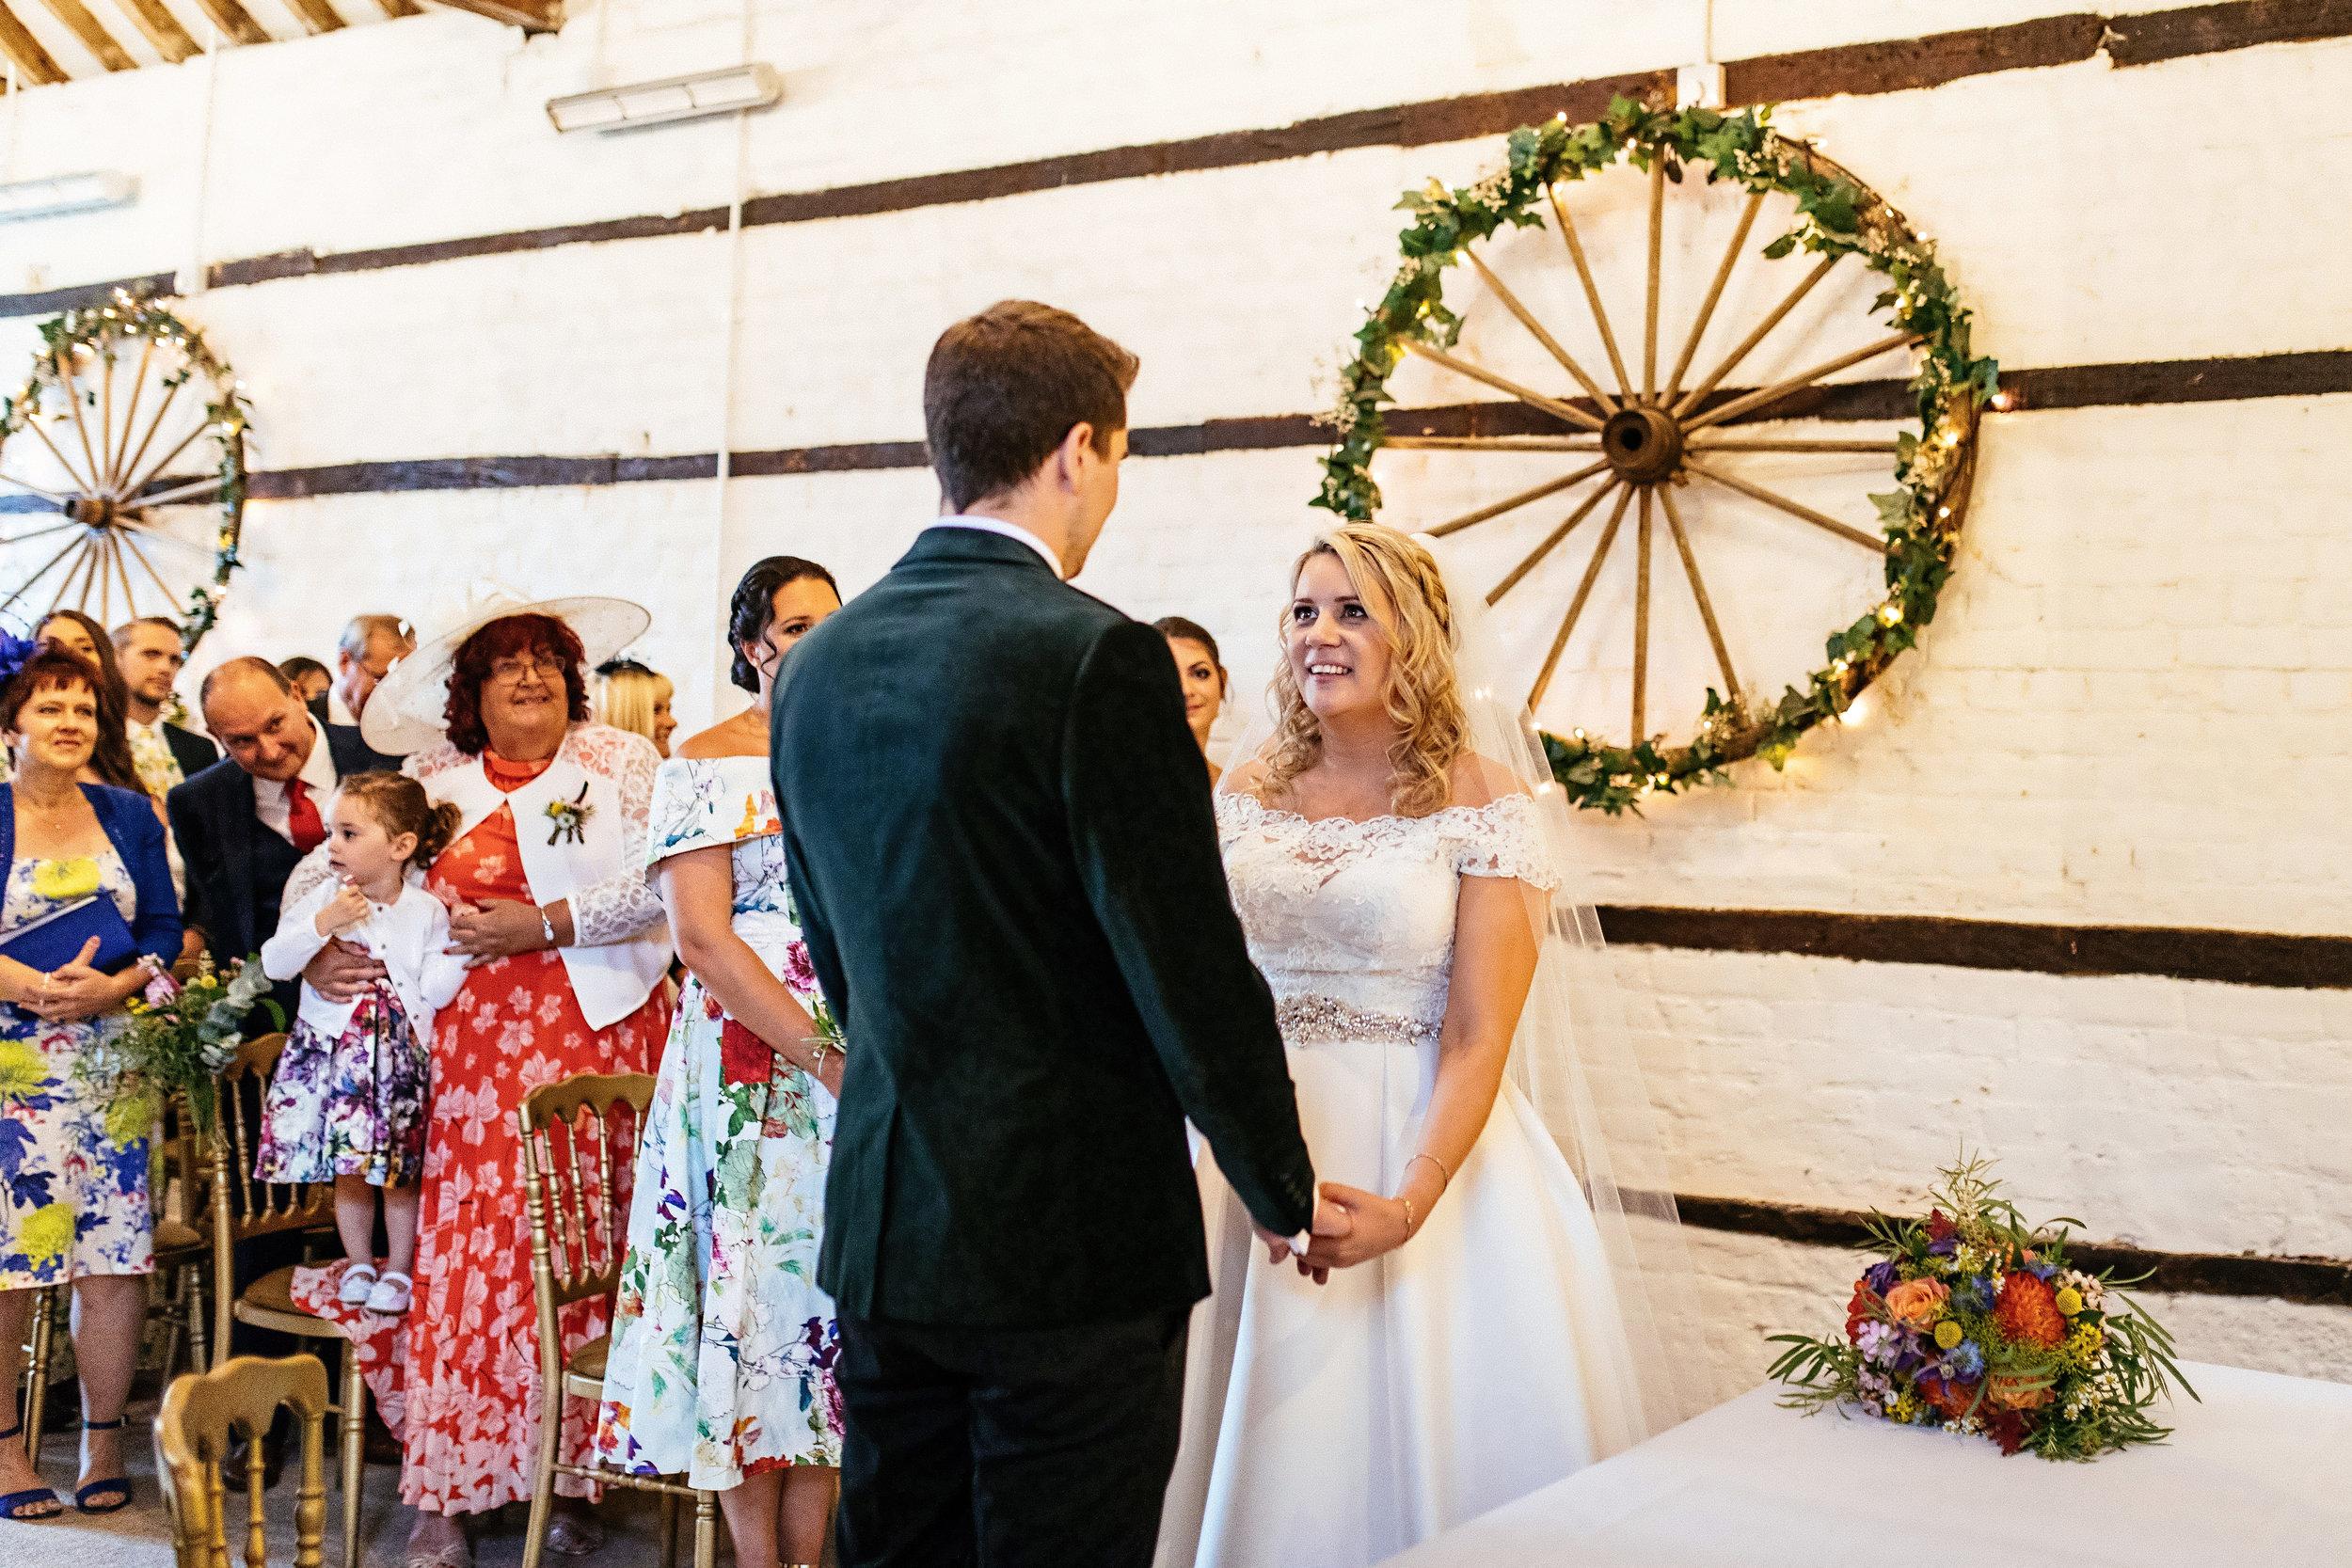 Tamara-and-Richard-Wedding-Highlights-23.jpg